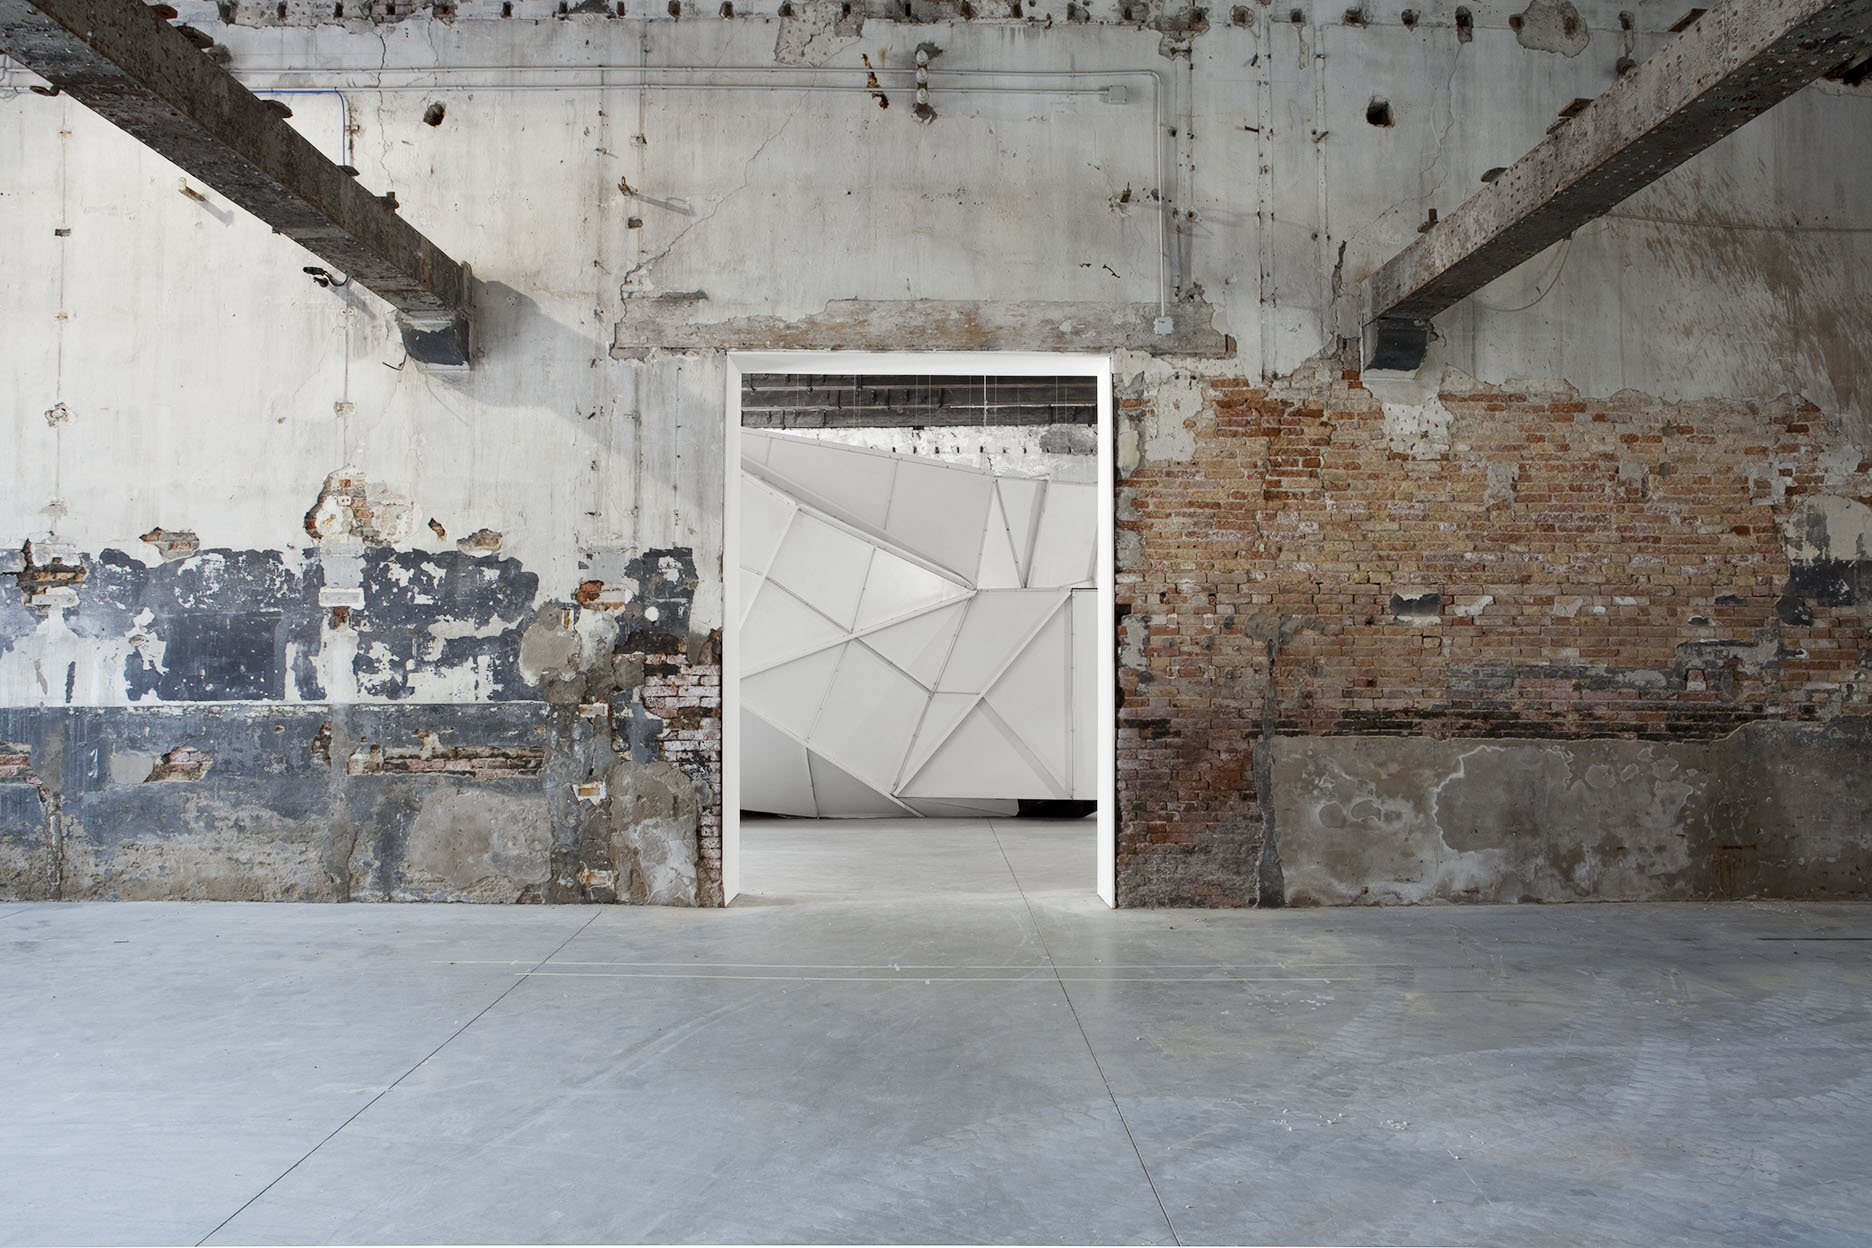 Berger&Berger, Biennale of Venice, 2010